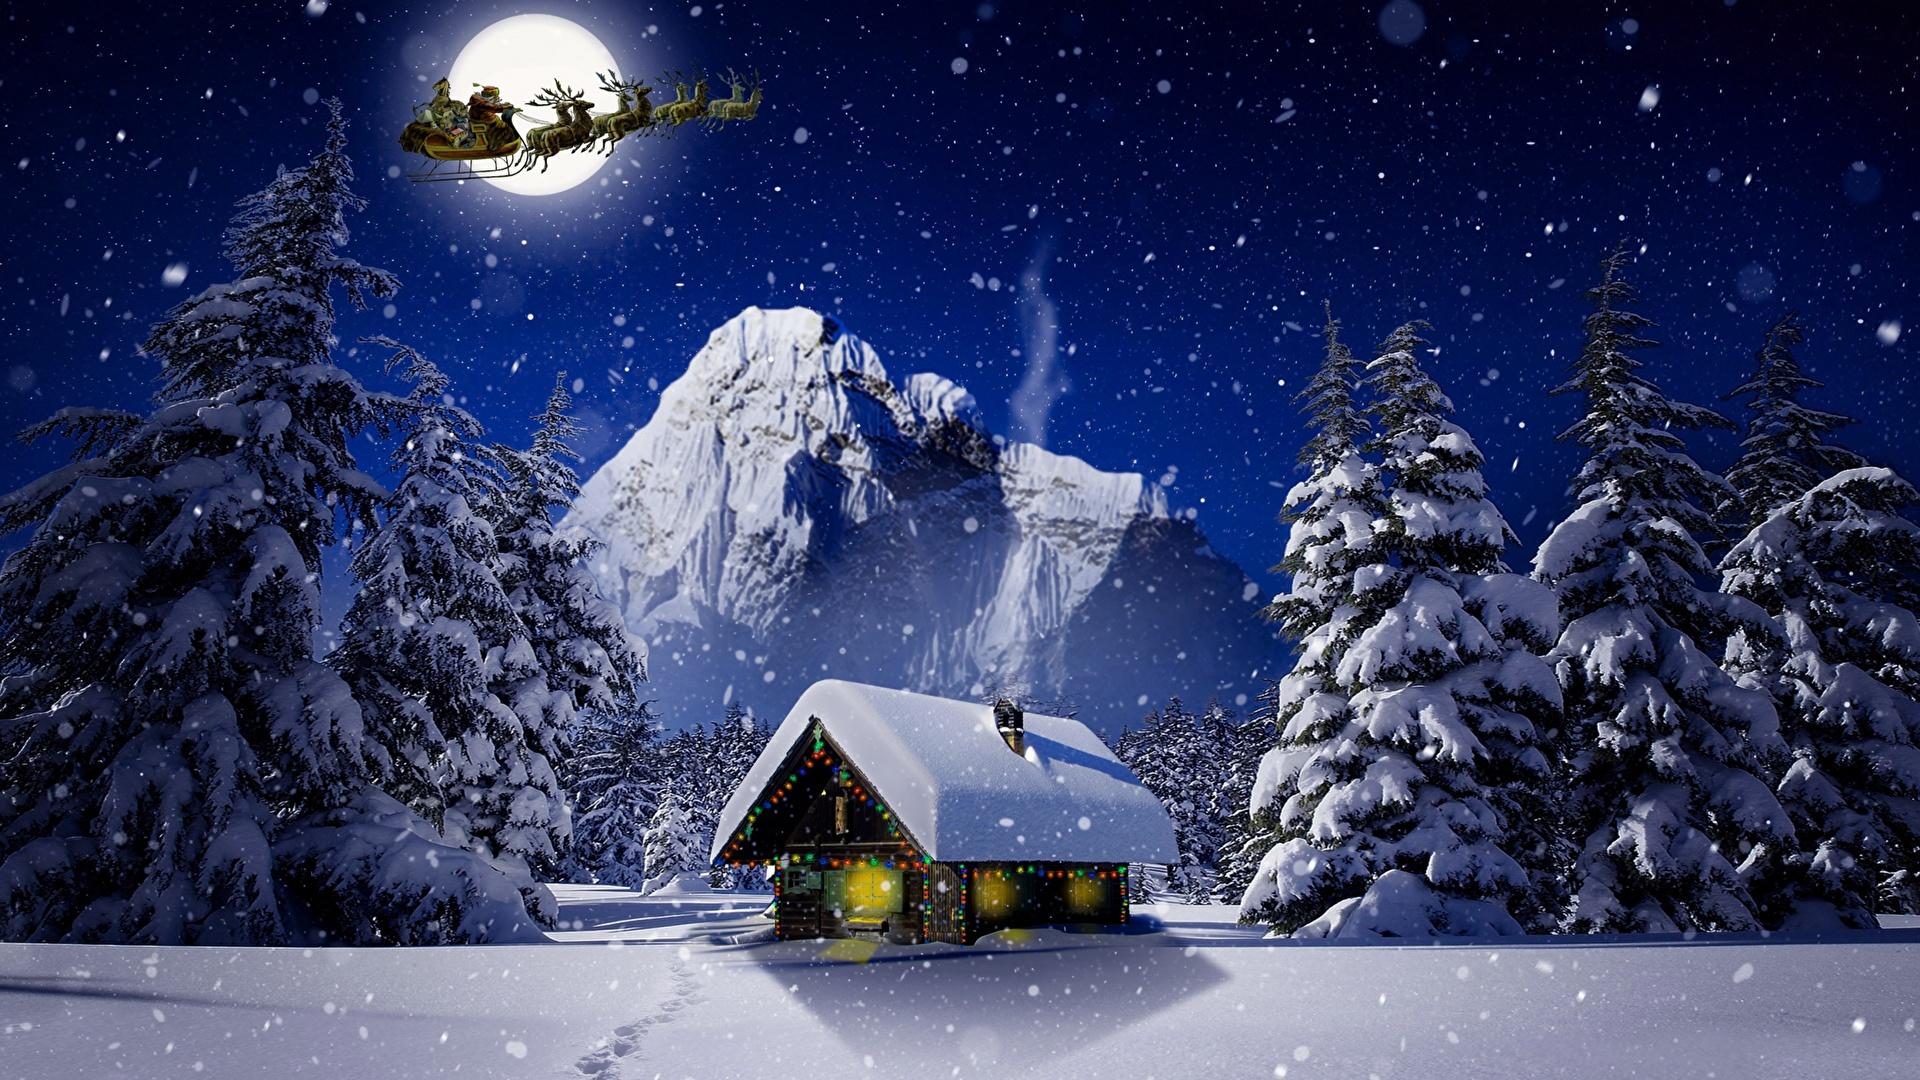 Images Deer Christmas Sleigh Nature Winter Moon Snow Night